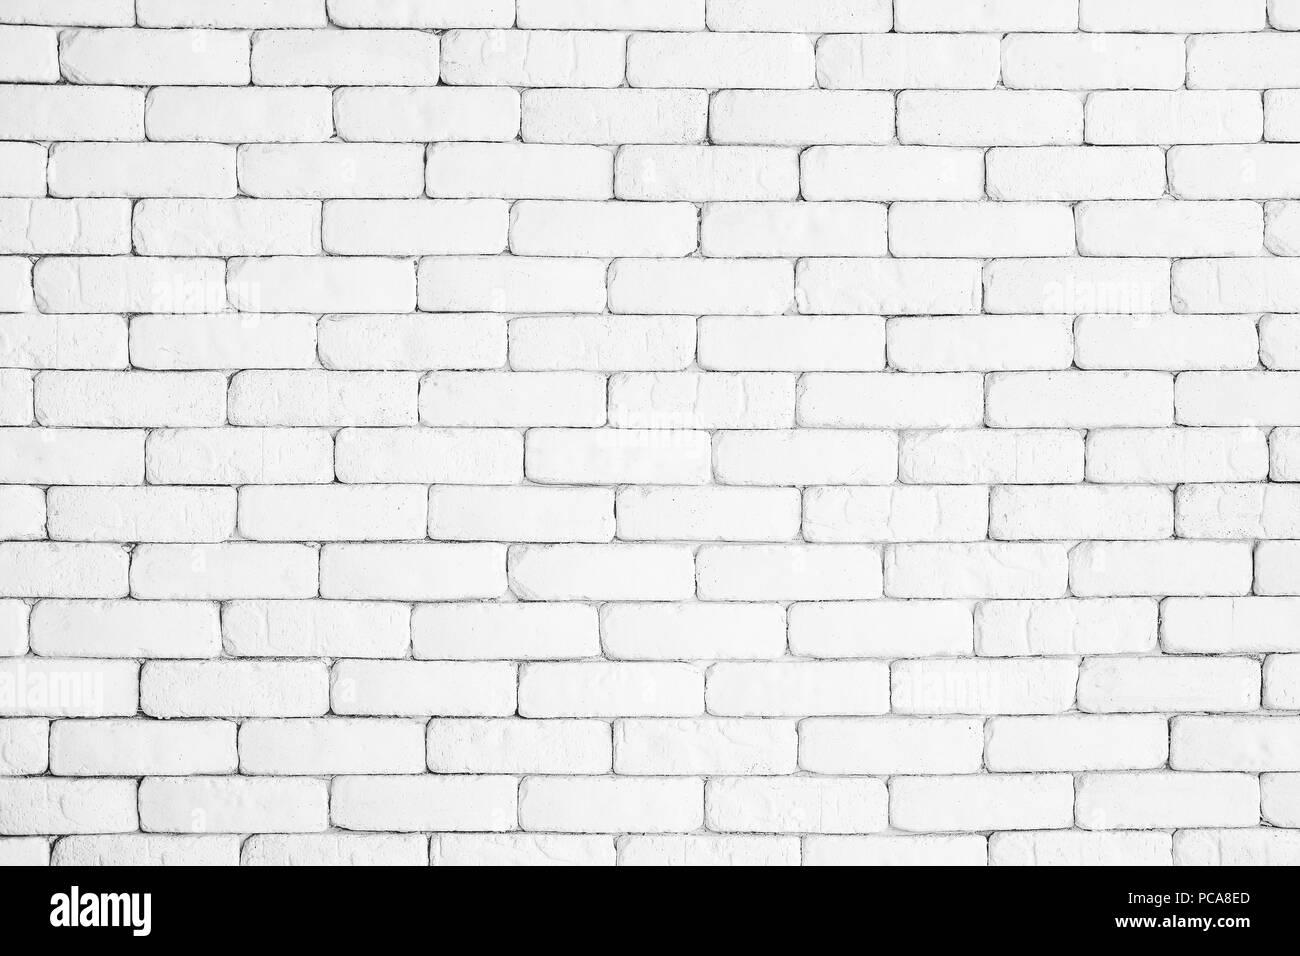 White Brick Wall Texture Design Empty White Brick